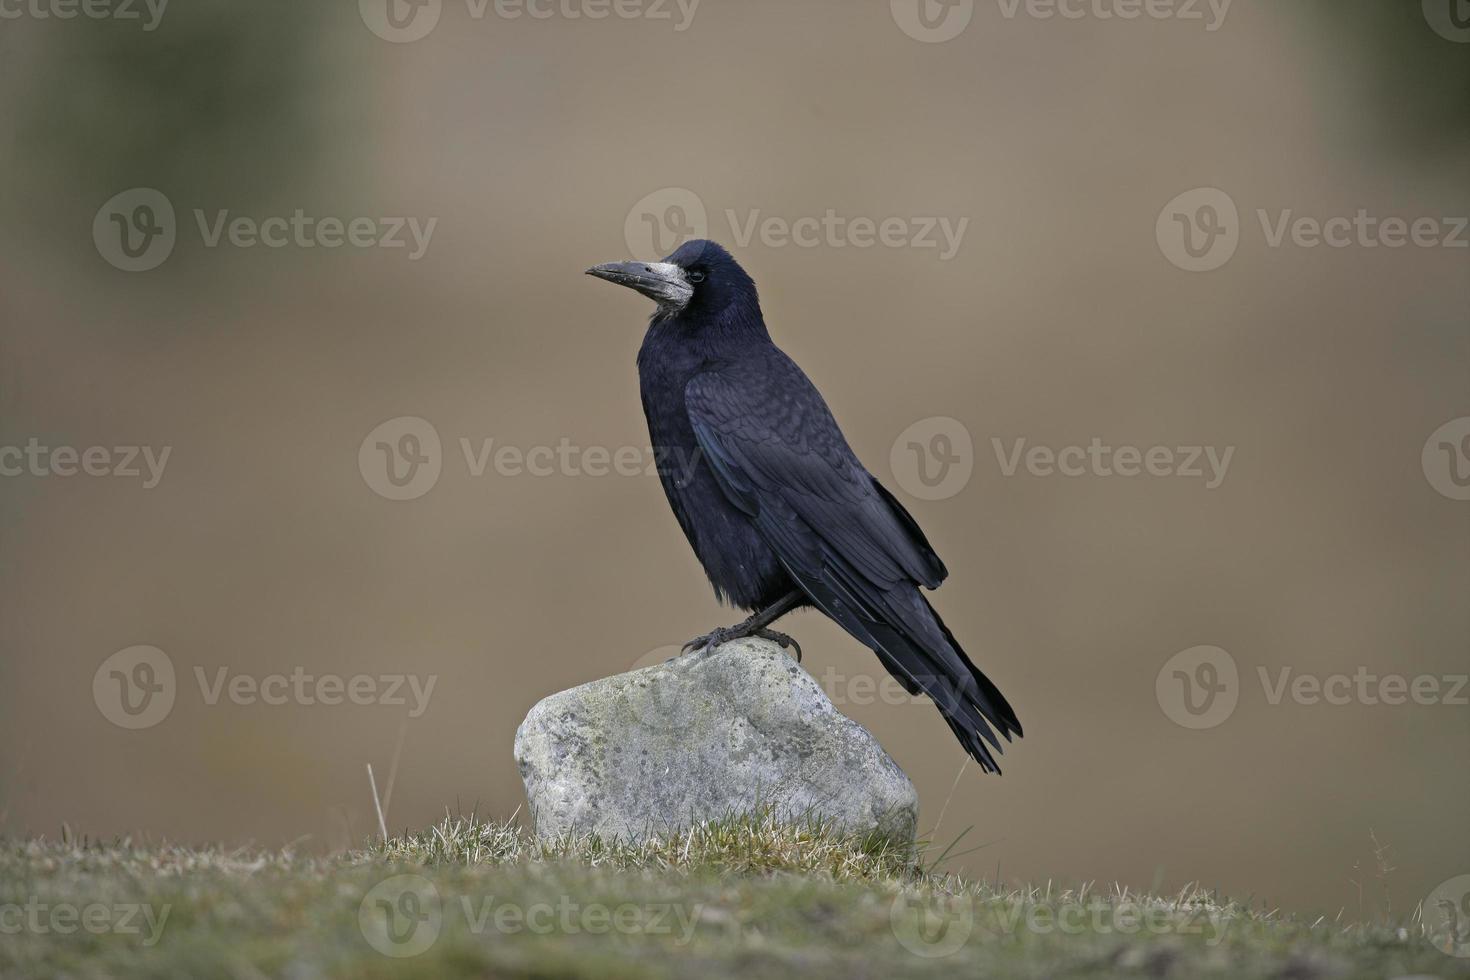 torre, corvus frugilegus, foto